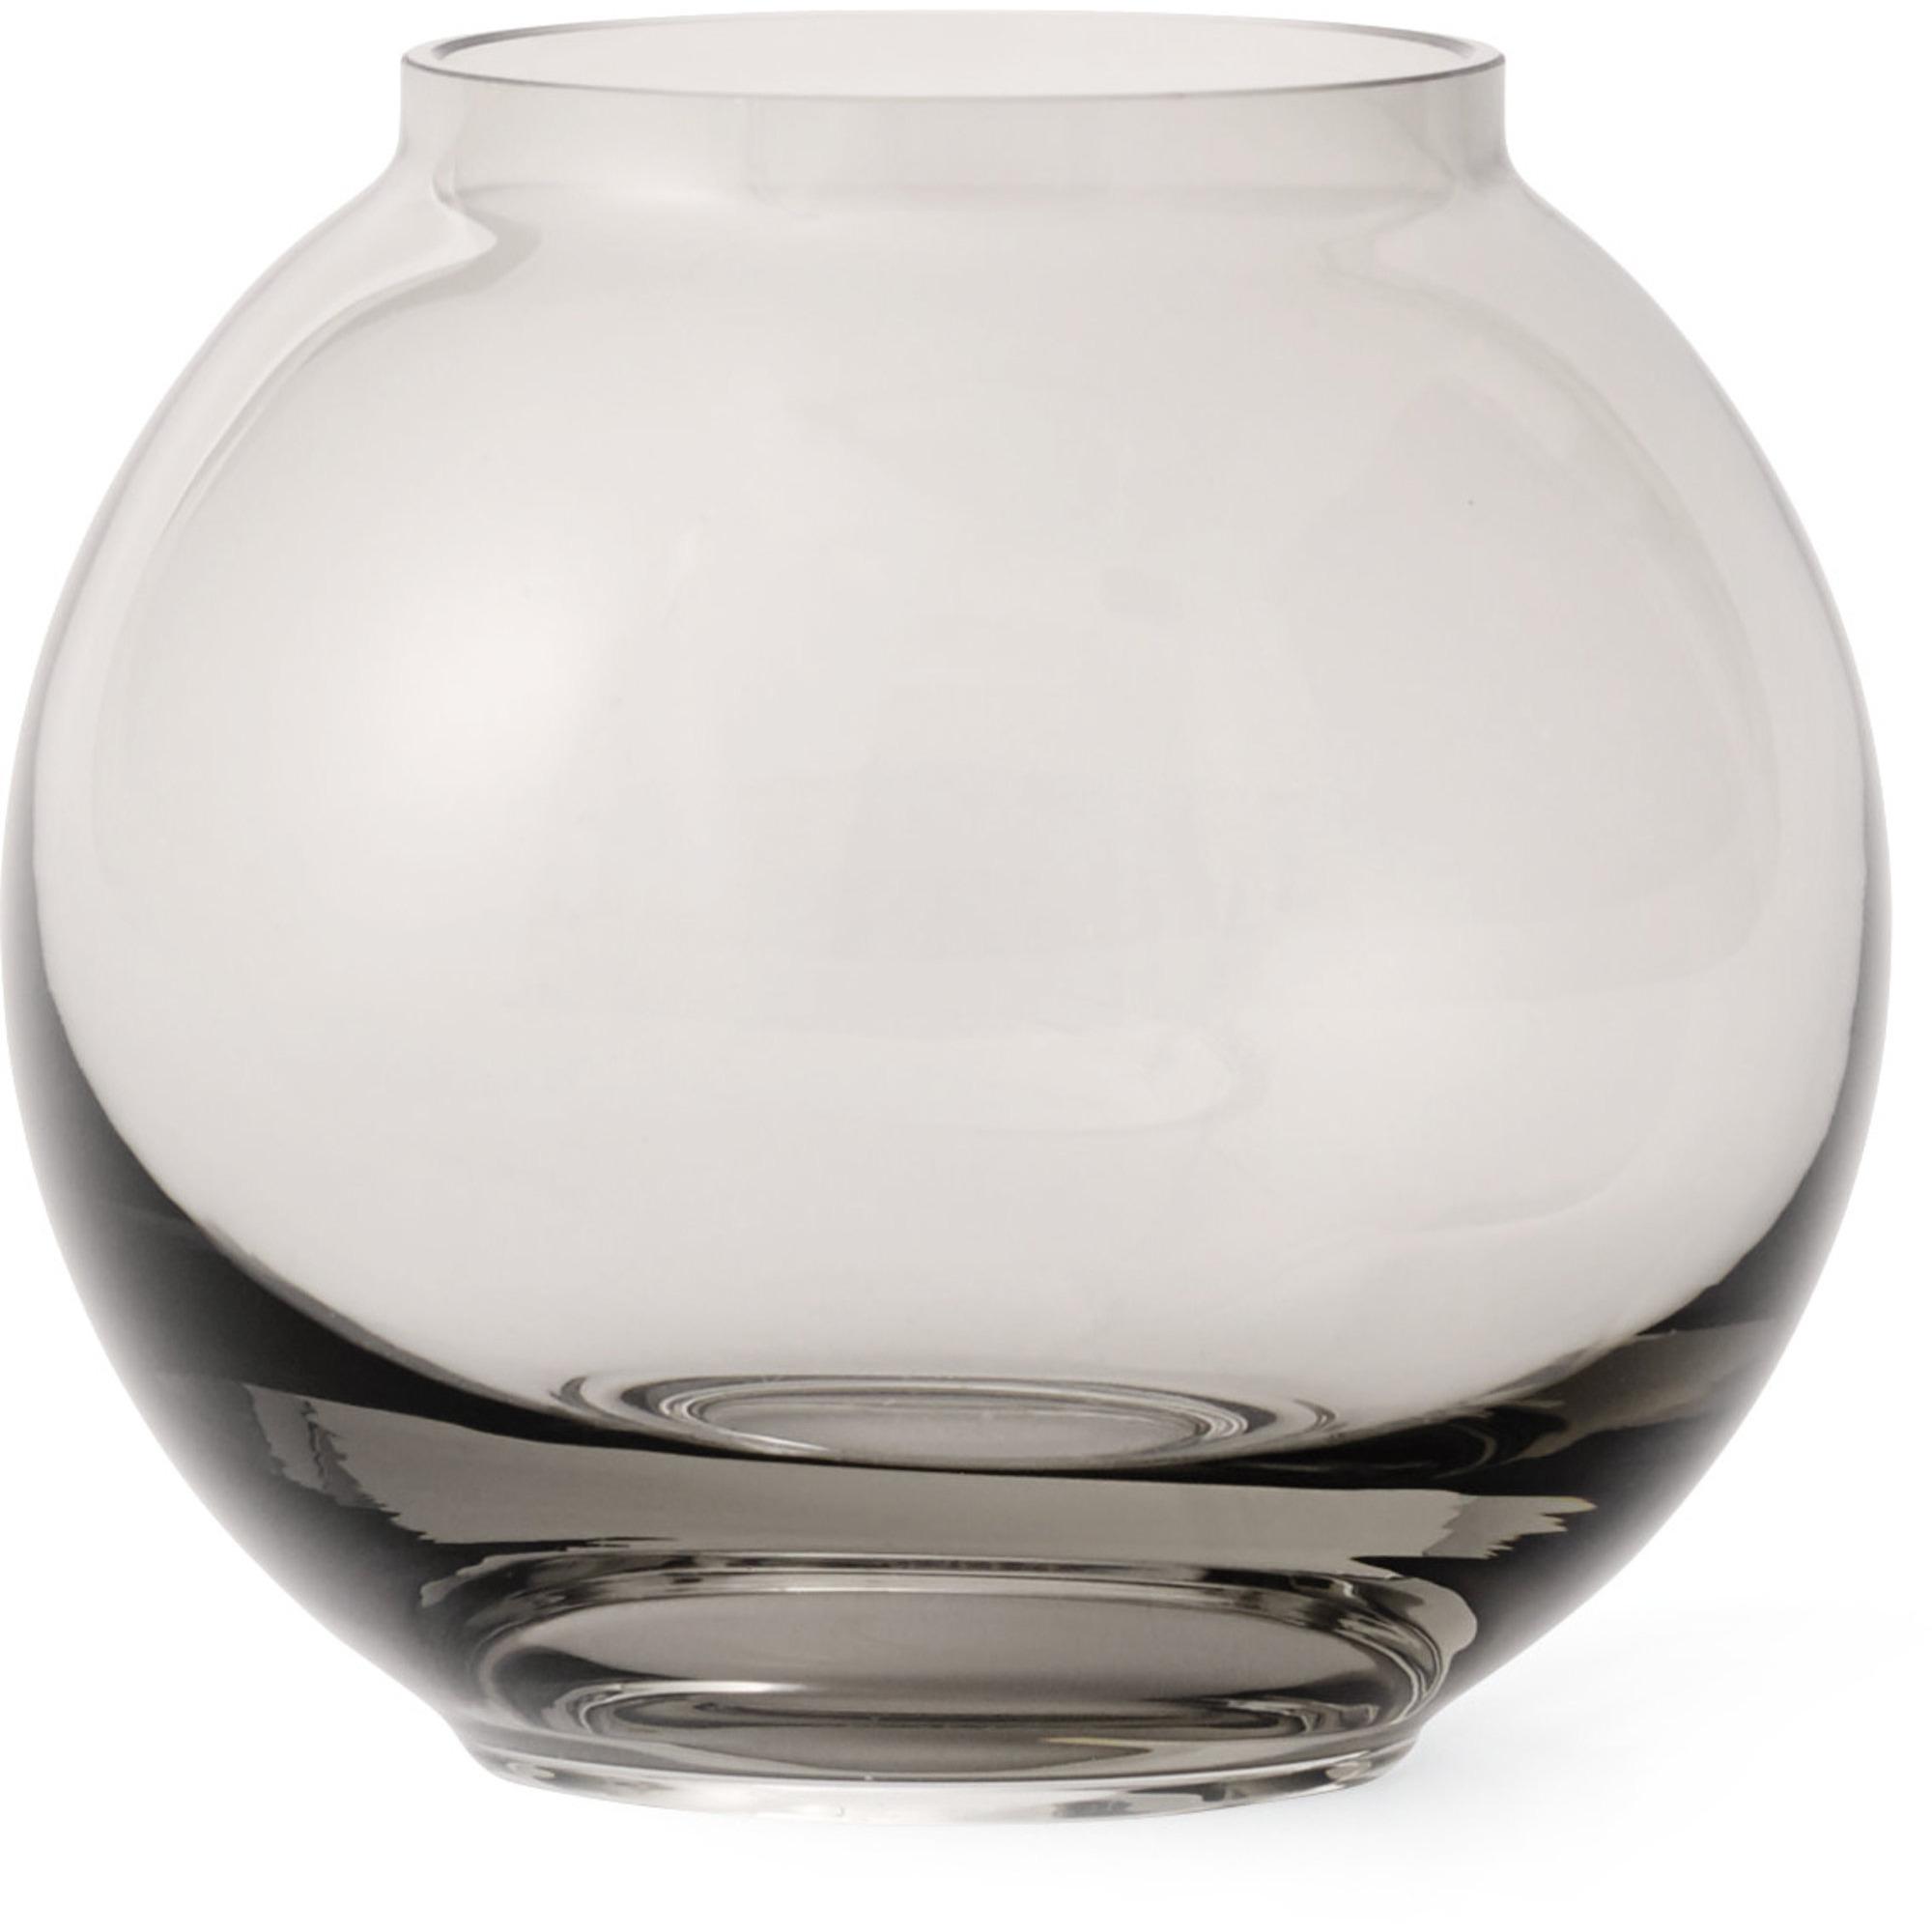 Lyngby Porcelæn Form 70/2 H 10 cm. smoke